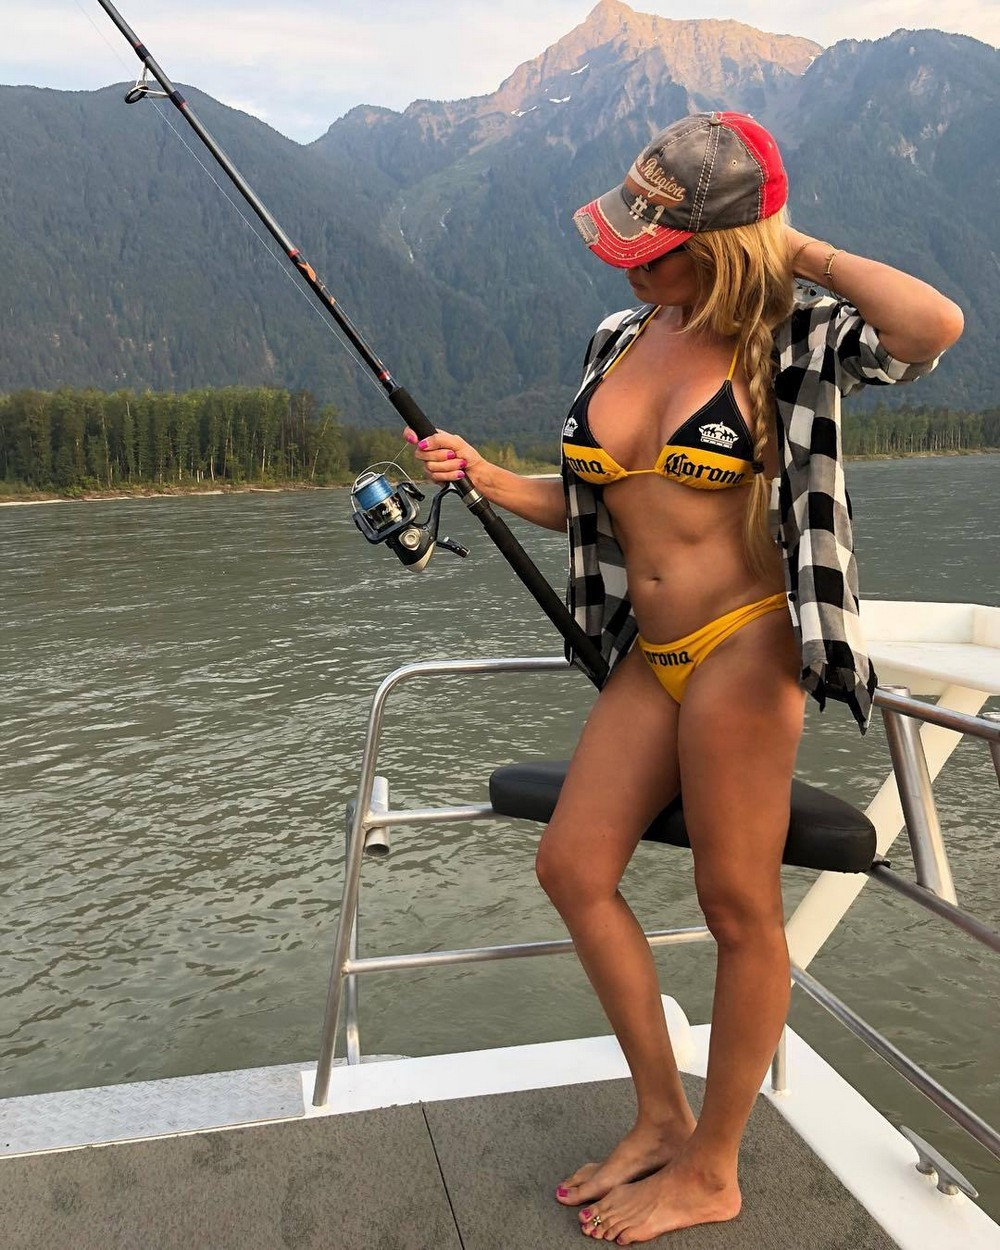 Redneck women hot girls fishing